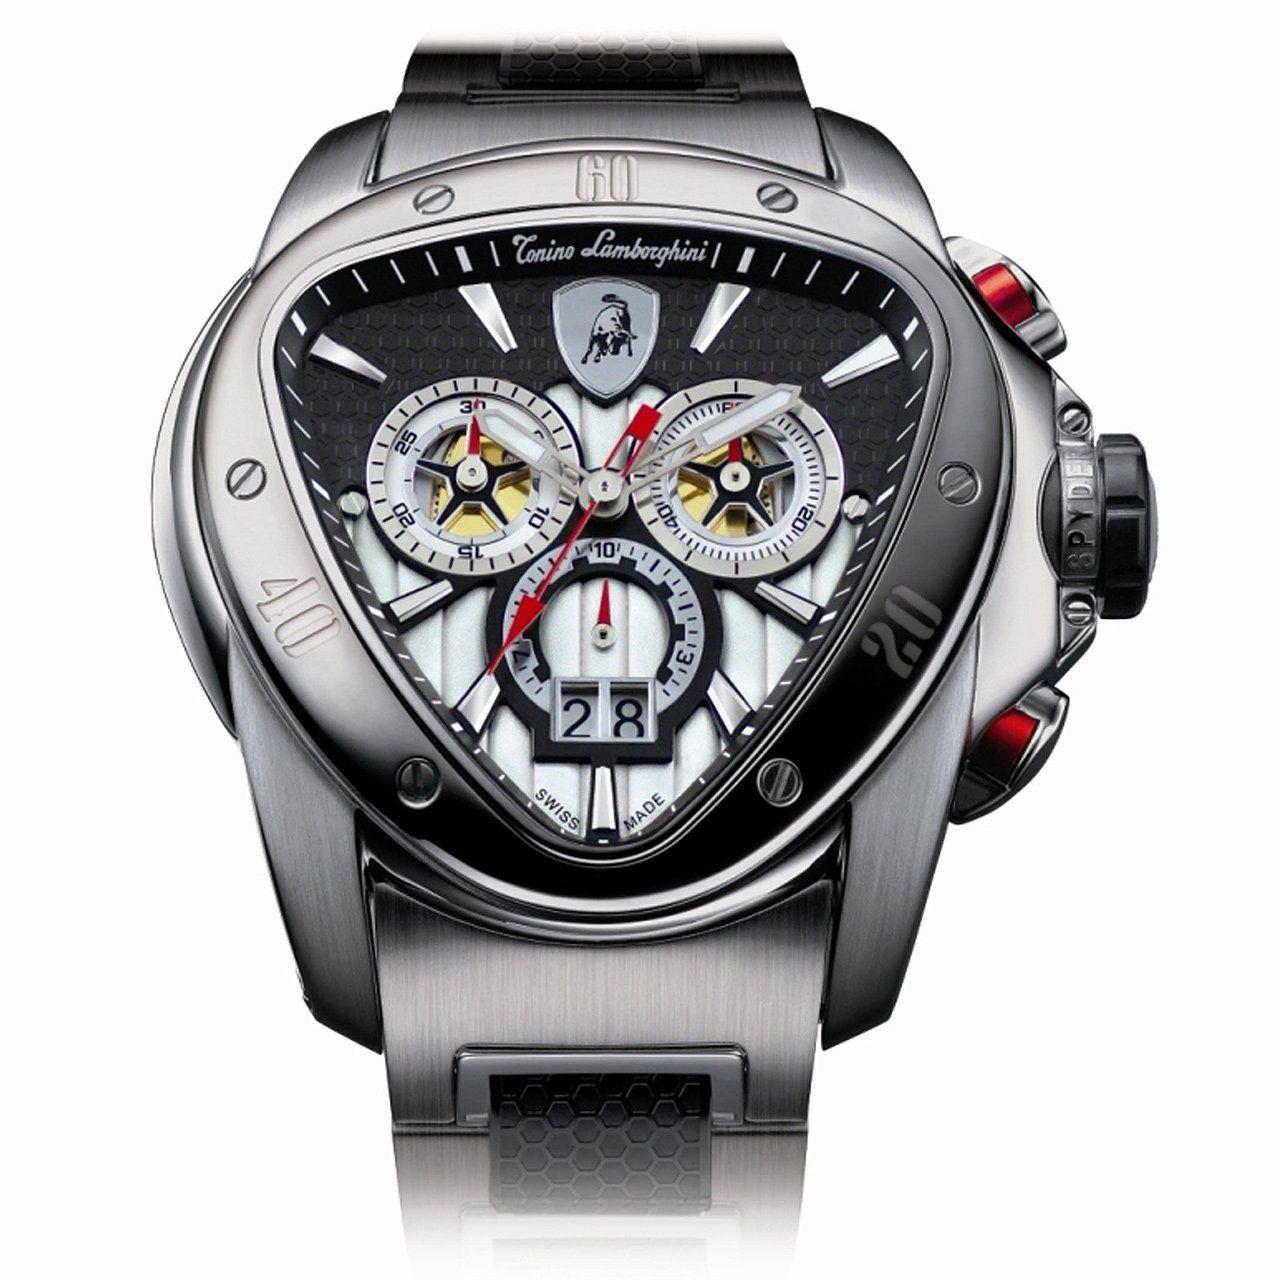 7d0bbd55f390 Tonino Lamborghini Spyder Chronograph 1000 Watch Relojes Hombre